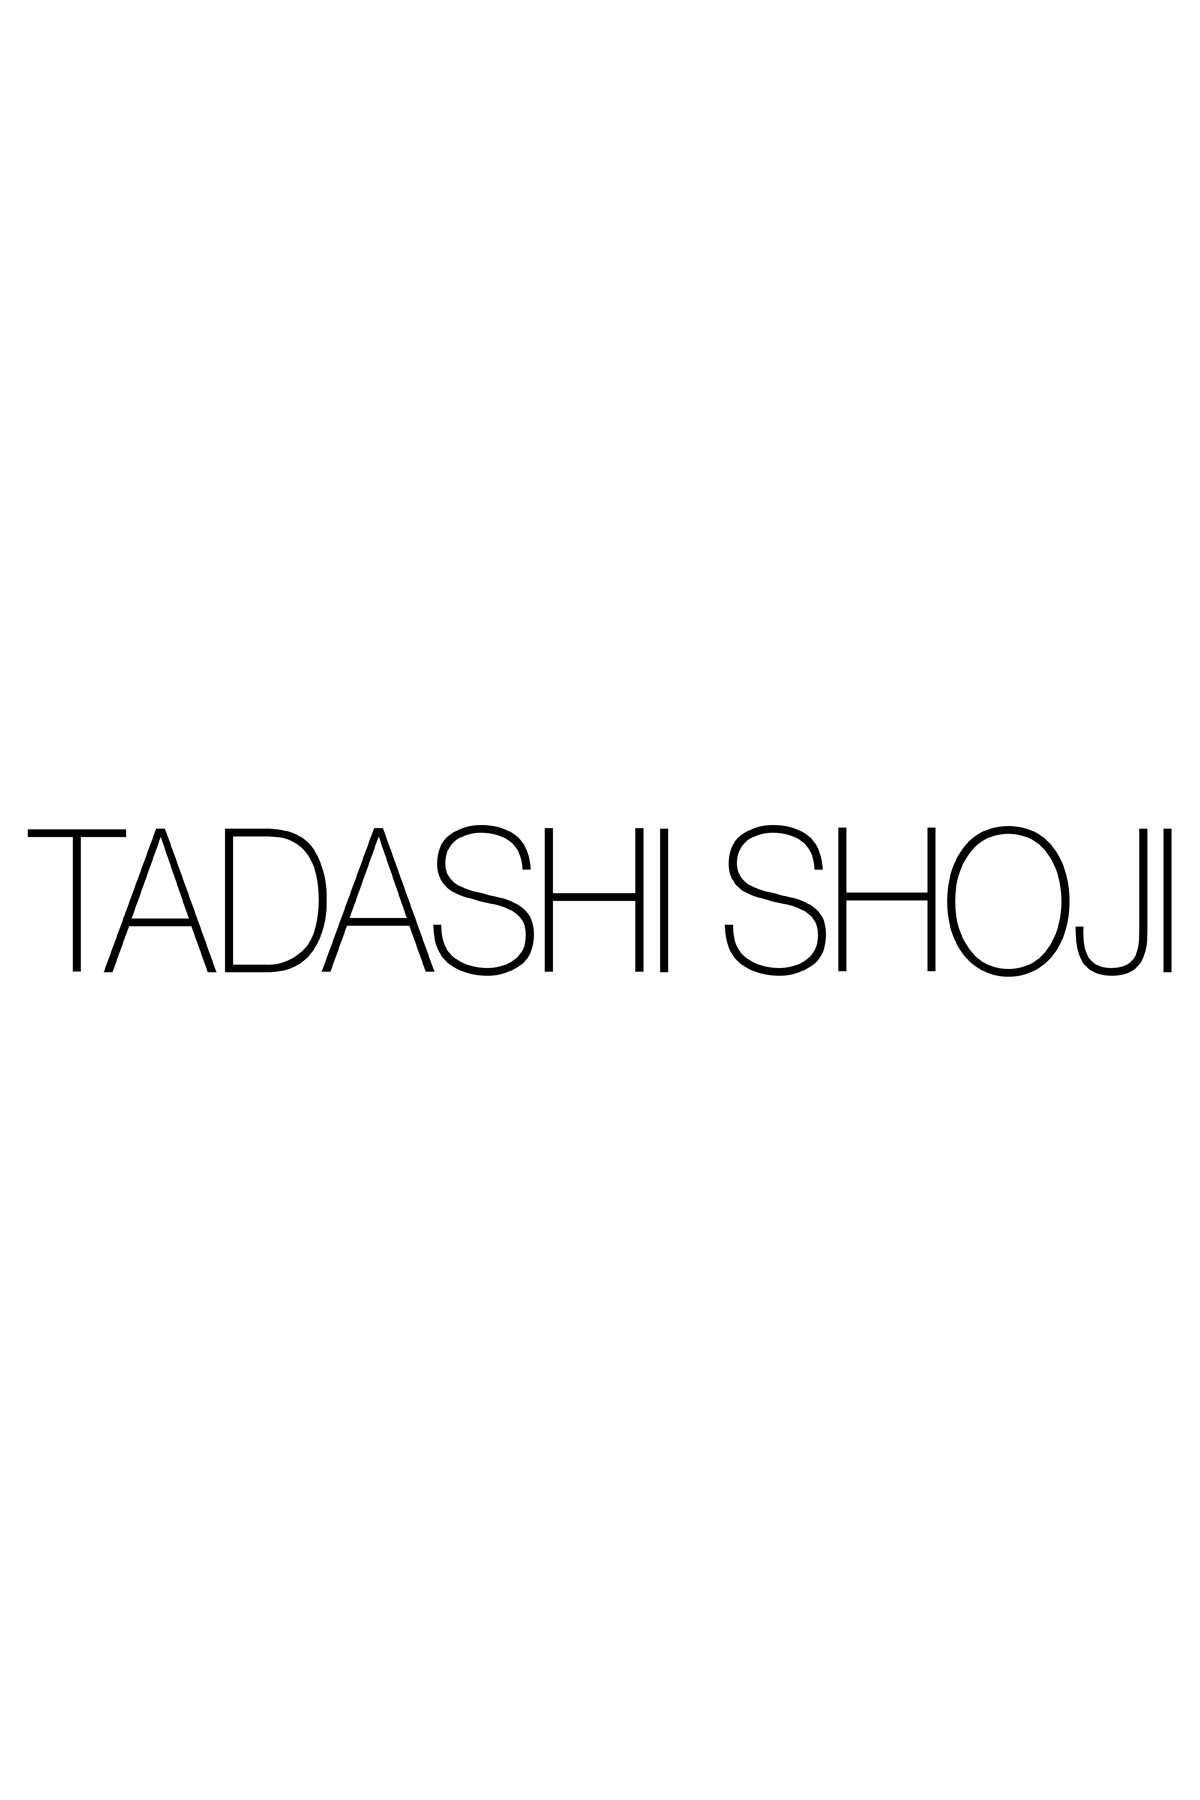 Betul Sequin-Embroidered Illusion Dress - PLUS SIZE